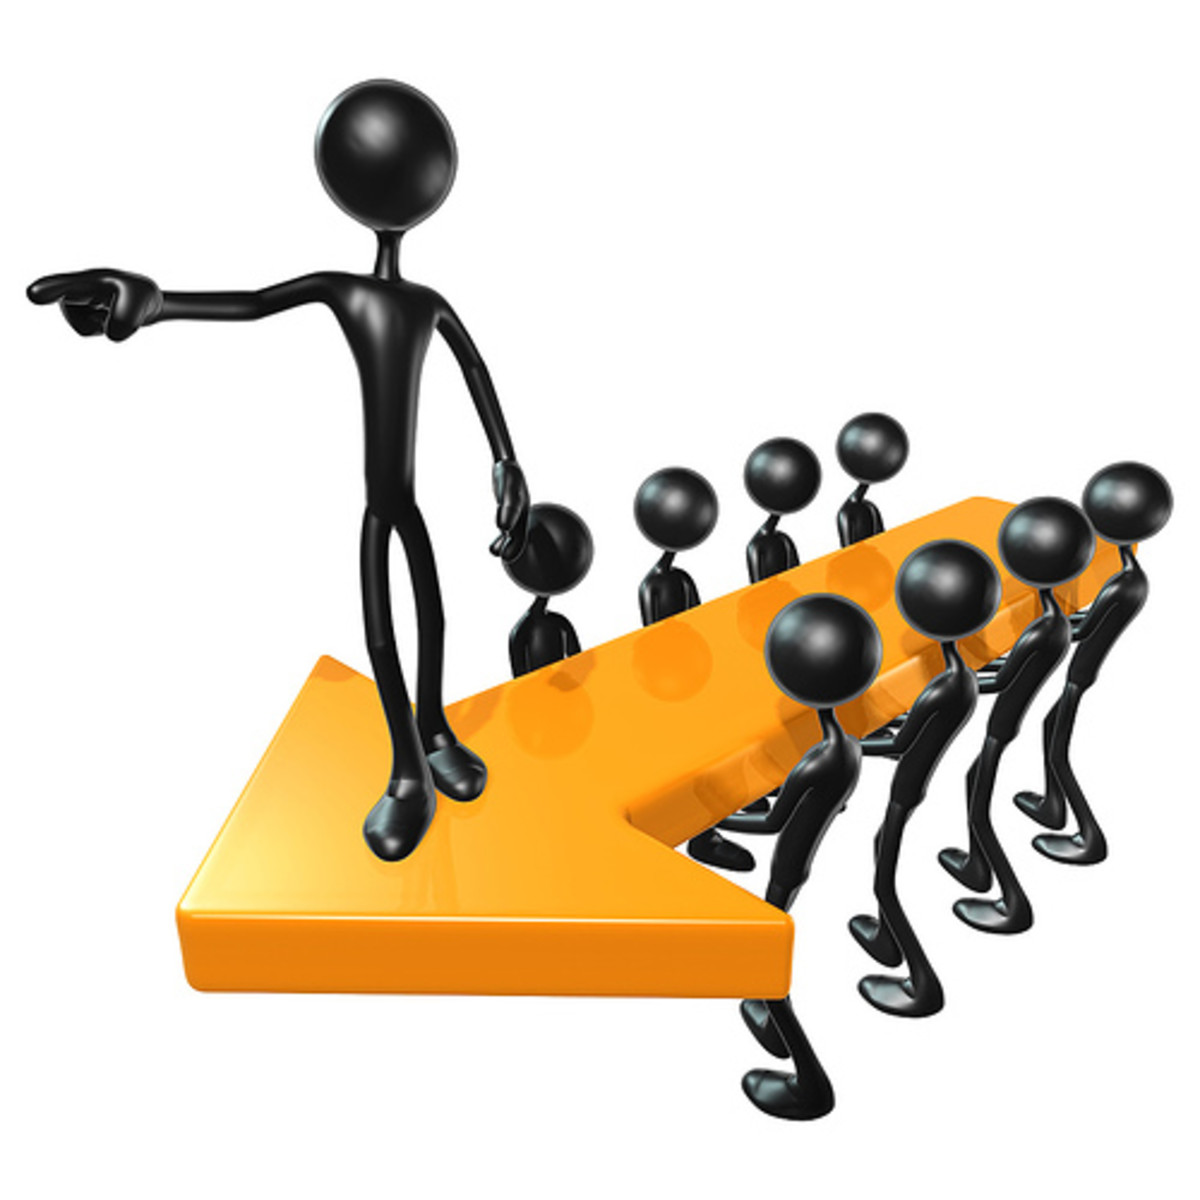 leadership-based-on-biblical-principles-7-leadership-lessons-from-king-solomon